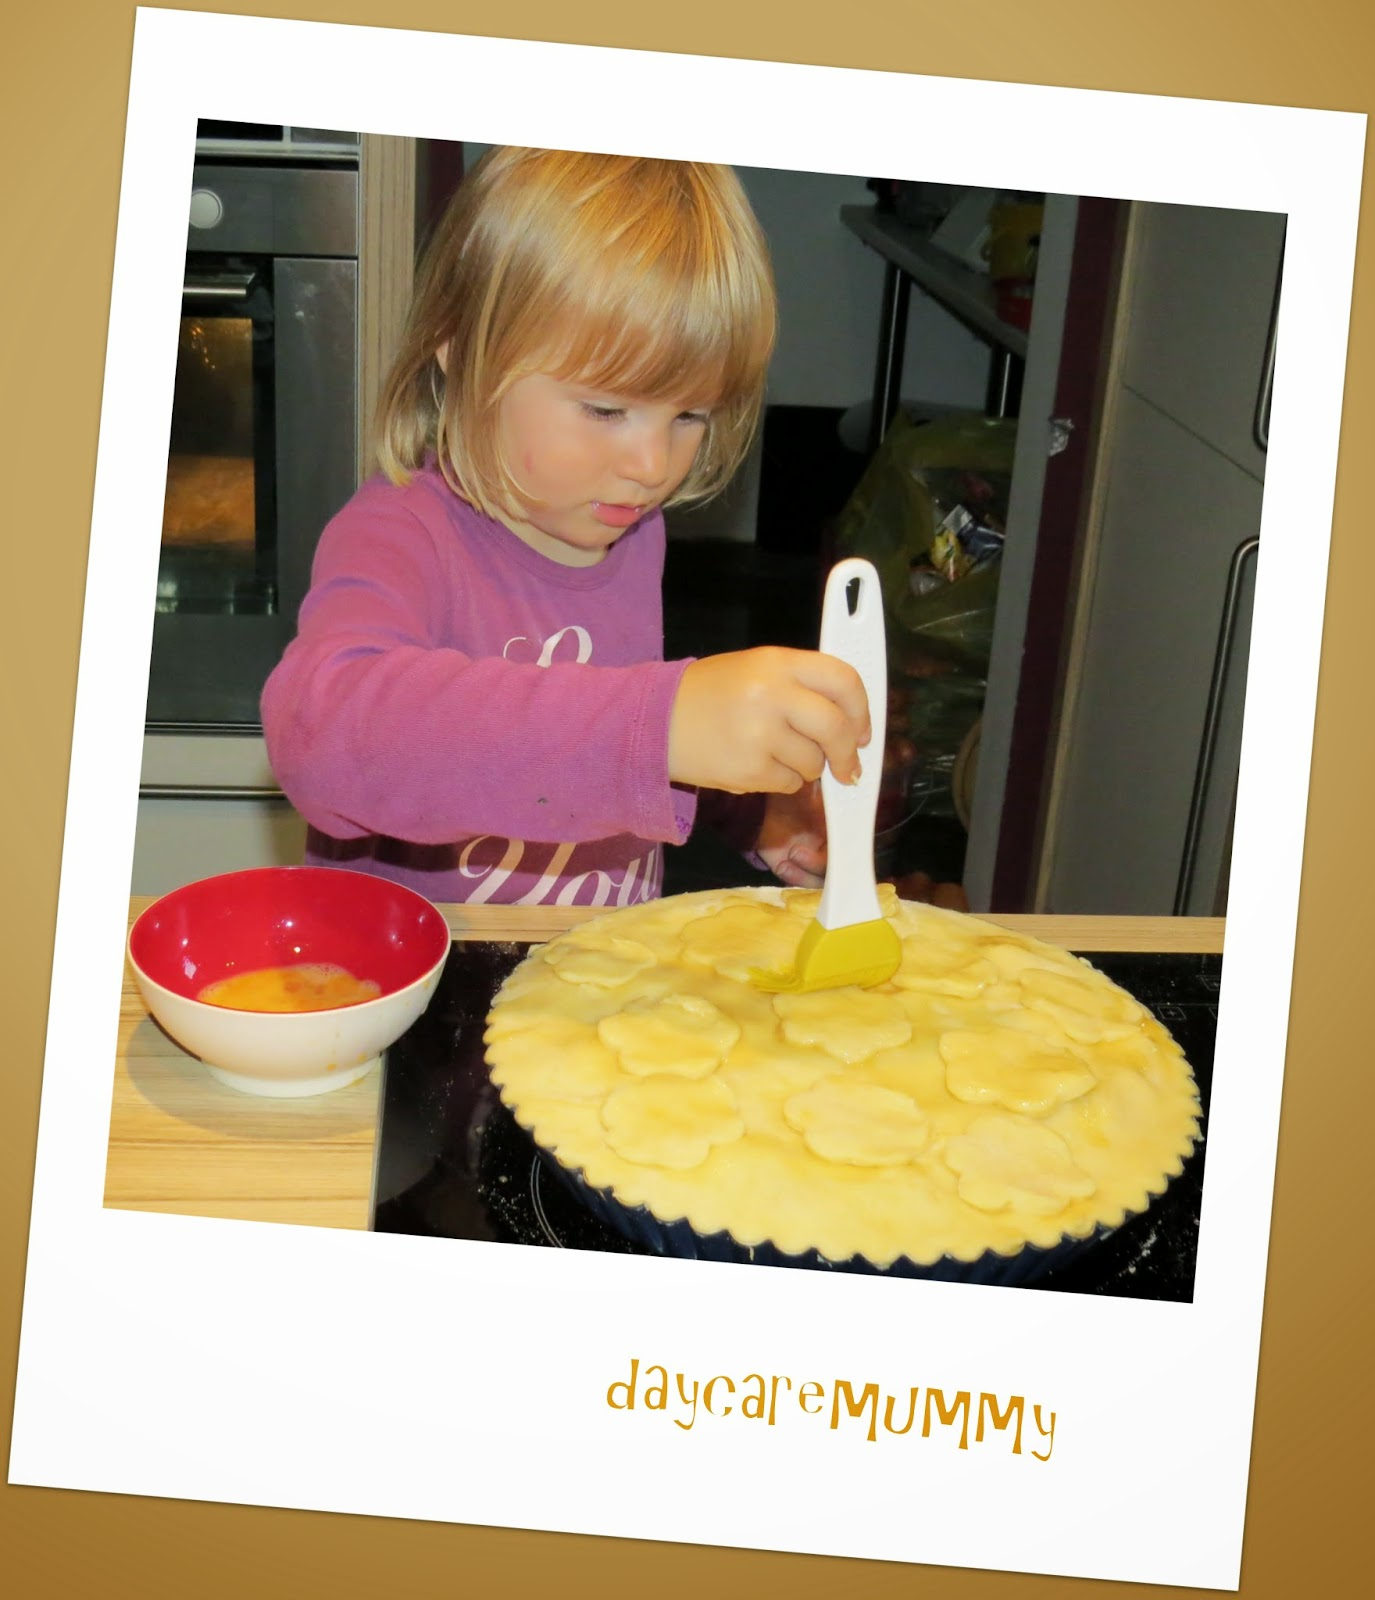 daycaremummy american apple pie. Black Bedroom Furniture Sets. Home Design Ideas